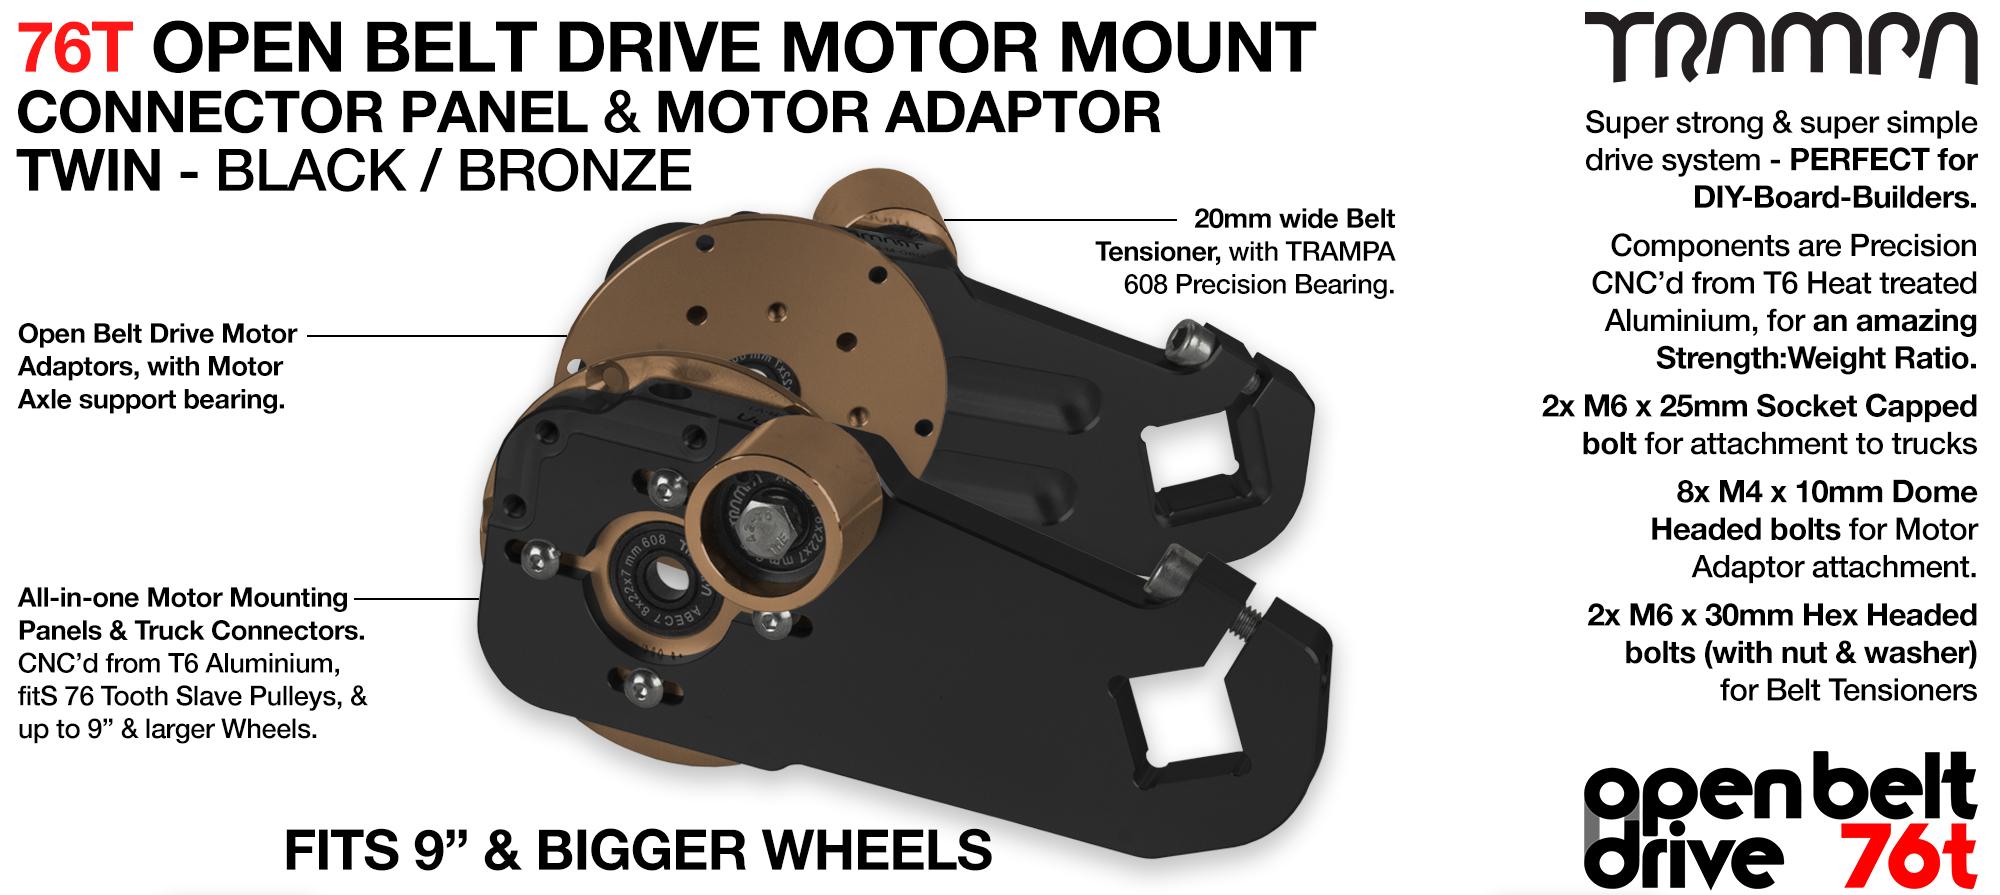 76T Open Belt Drive Motor Mount & Motor Adaptor - TWIN BRONZE